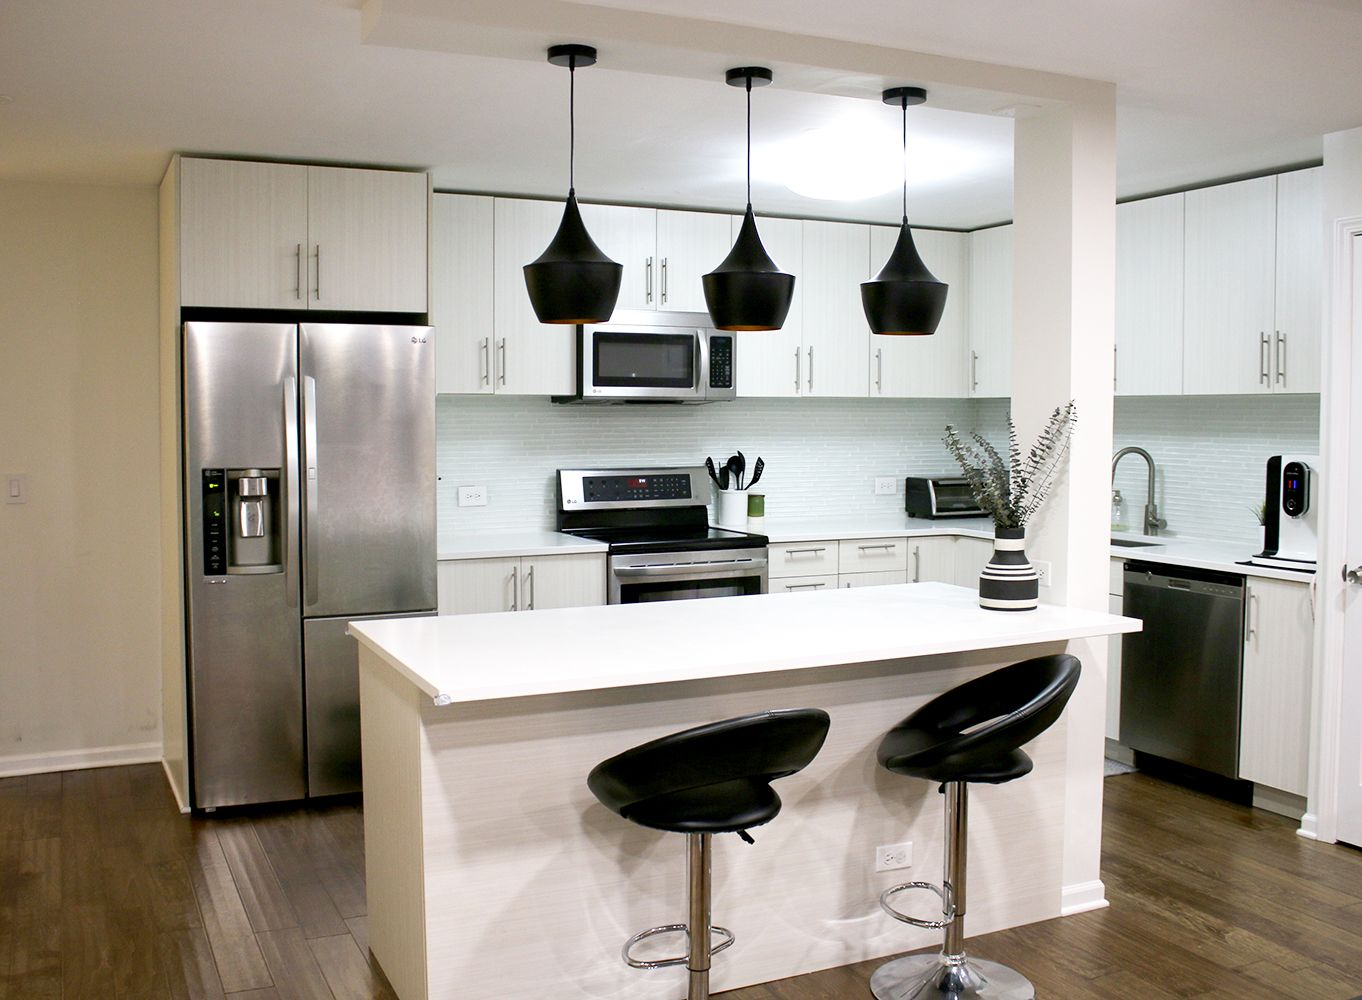 Modern kitchen with hardwood floors, black pendant